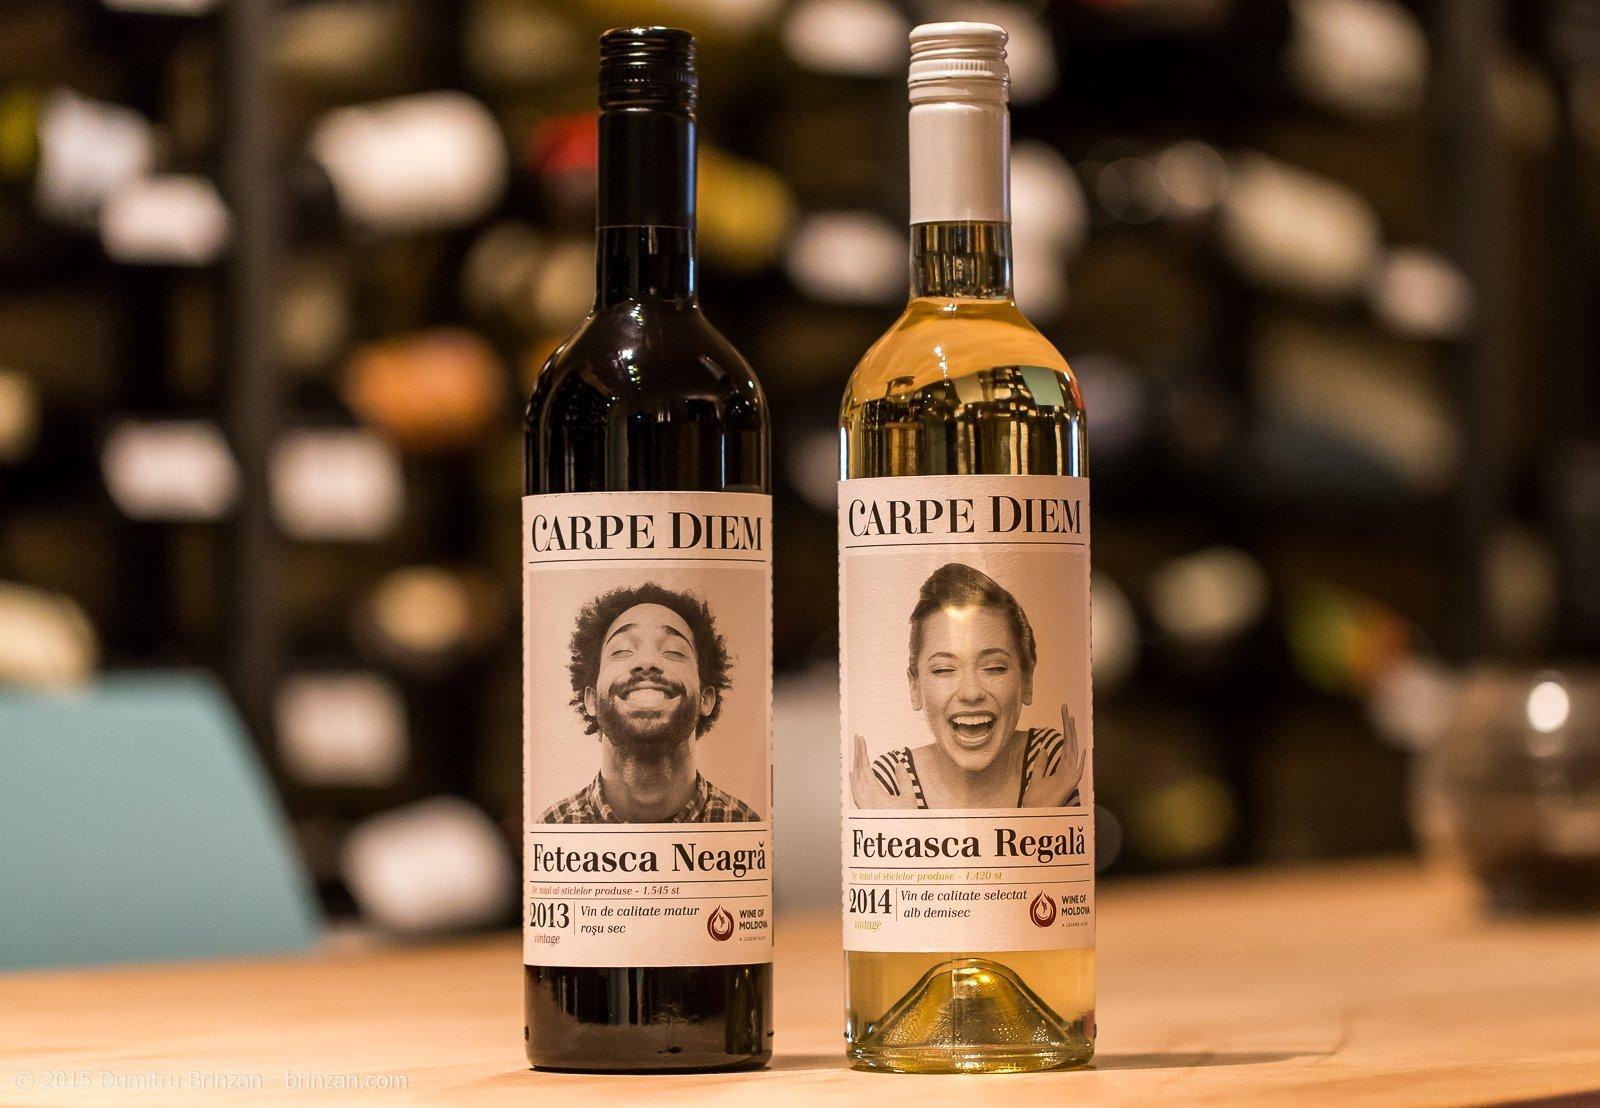 Bottles of Carpe Diem Feteasca Regala 2014 and Feteasca Neagra 2013